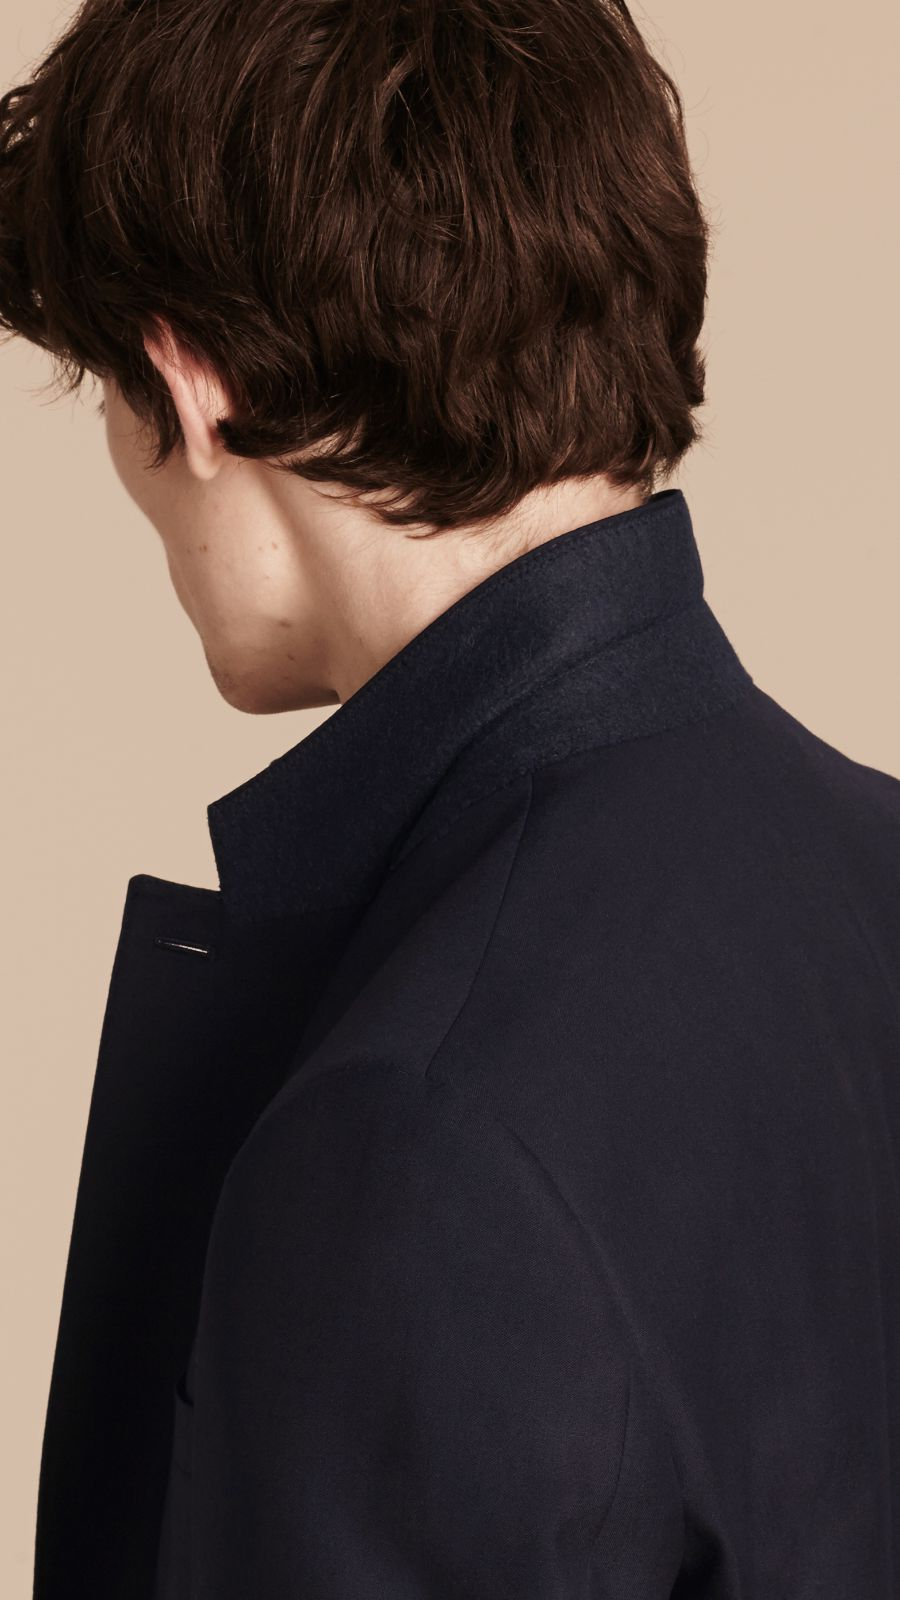 Navy Classic Fit Wool Part-canvas Suit Navy - Image 7